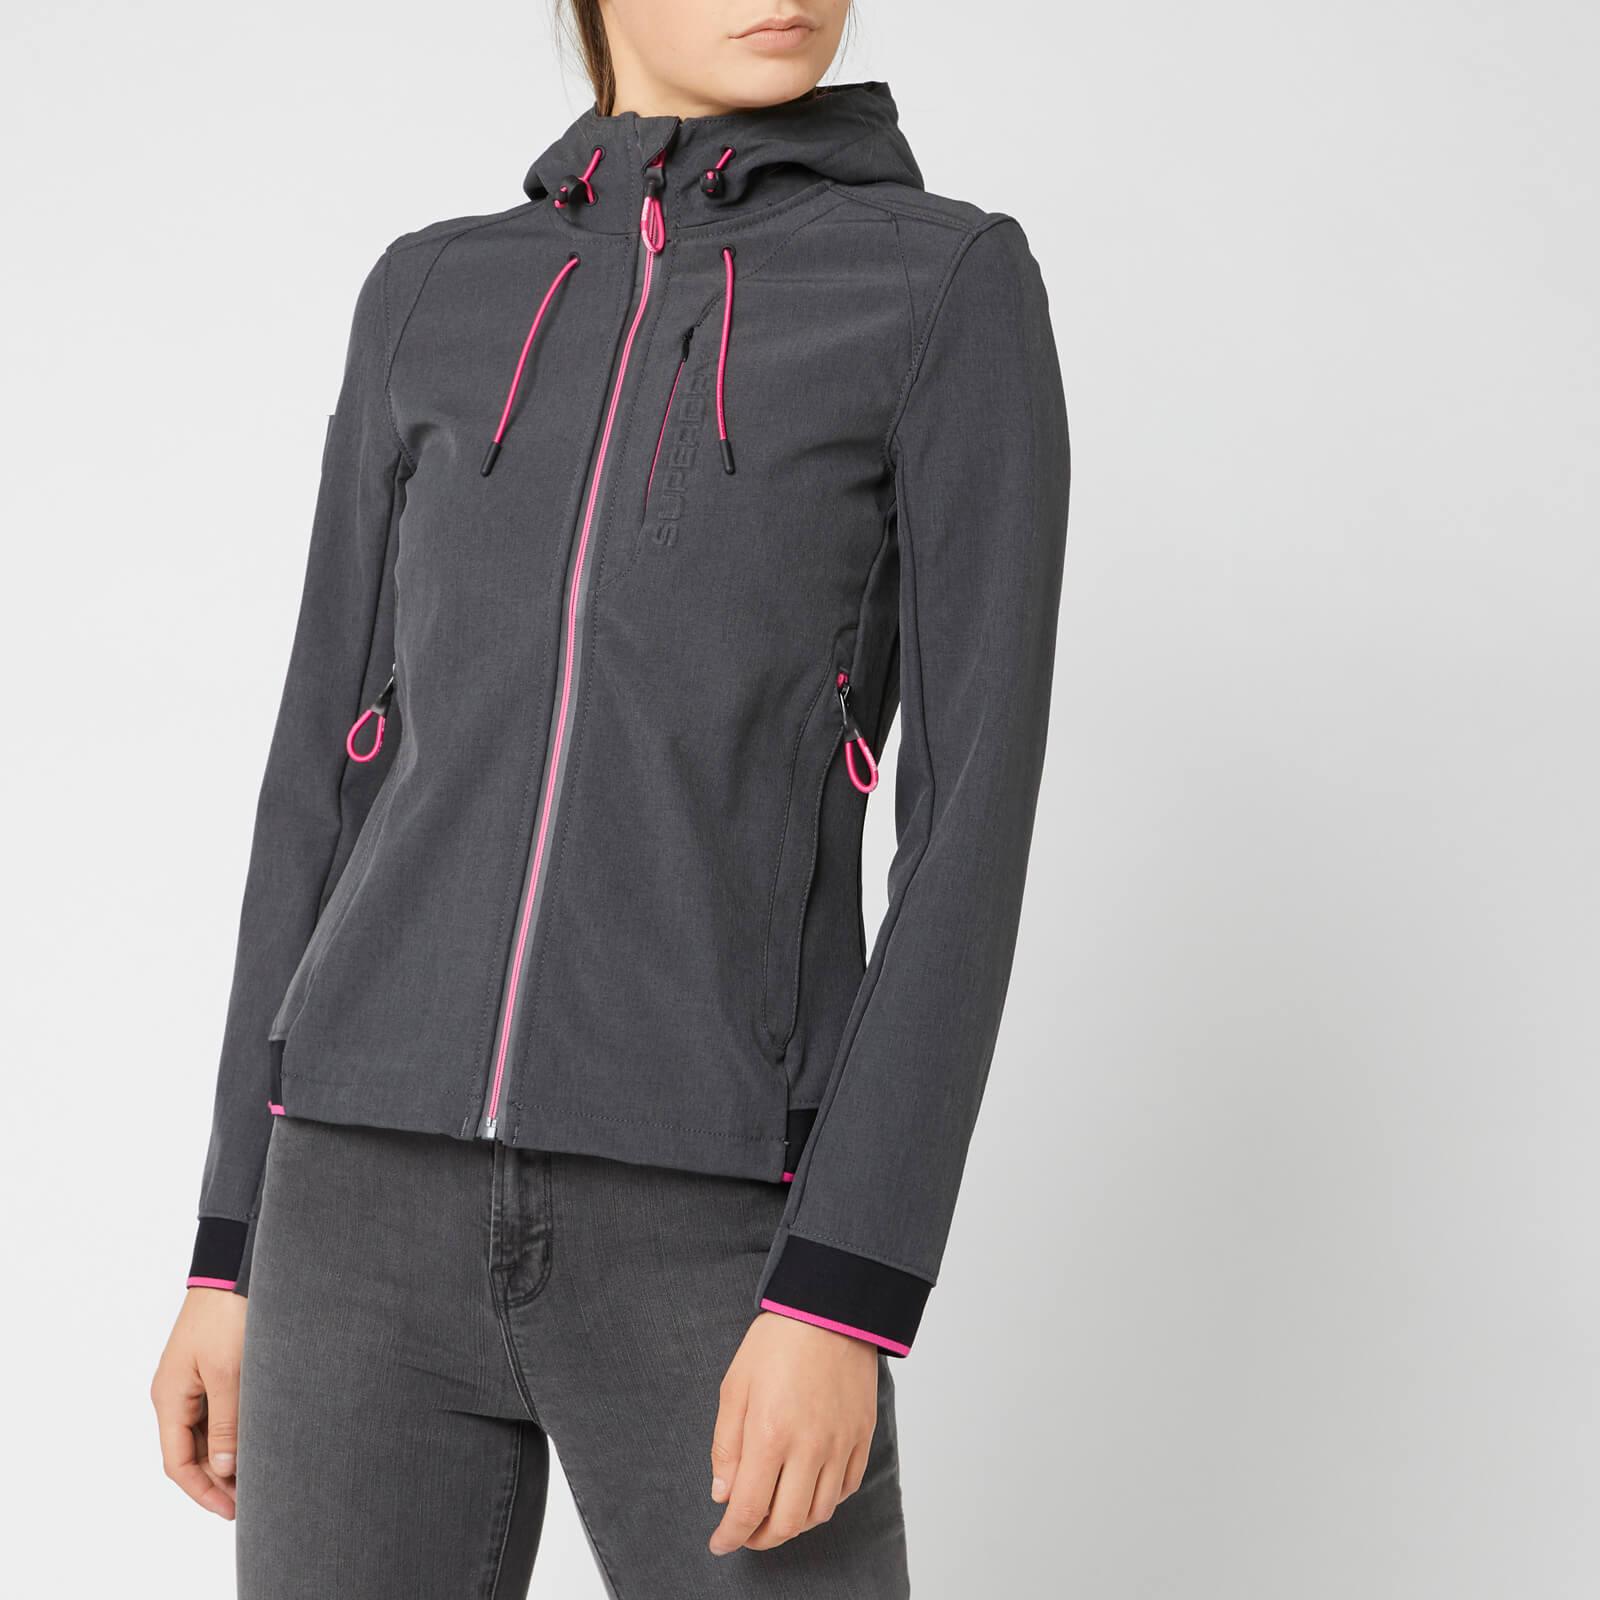 online shop professional design super specials Superdry Women's Nu Hooded Sd-Windtrekker - Dark Charcoal/Fluro Cherry